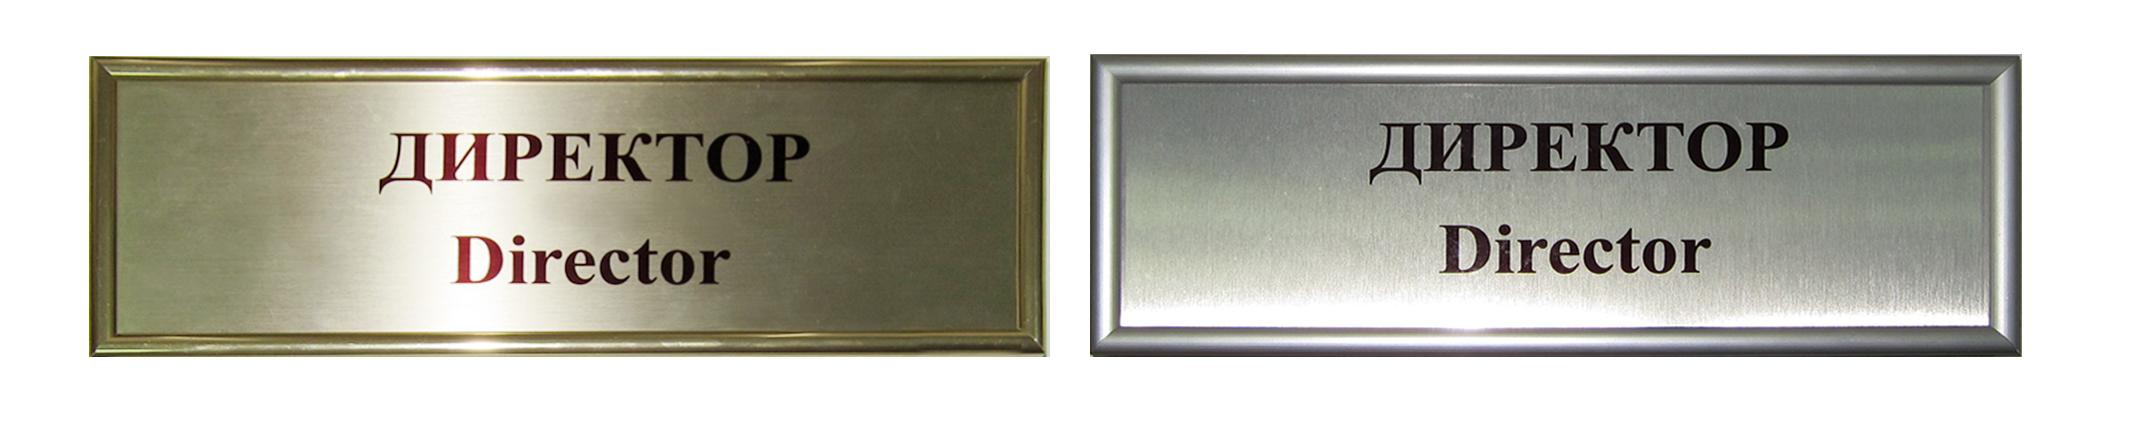 0-graverton-pechat-na-metalle-tehnologiya-graverton